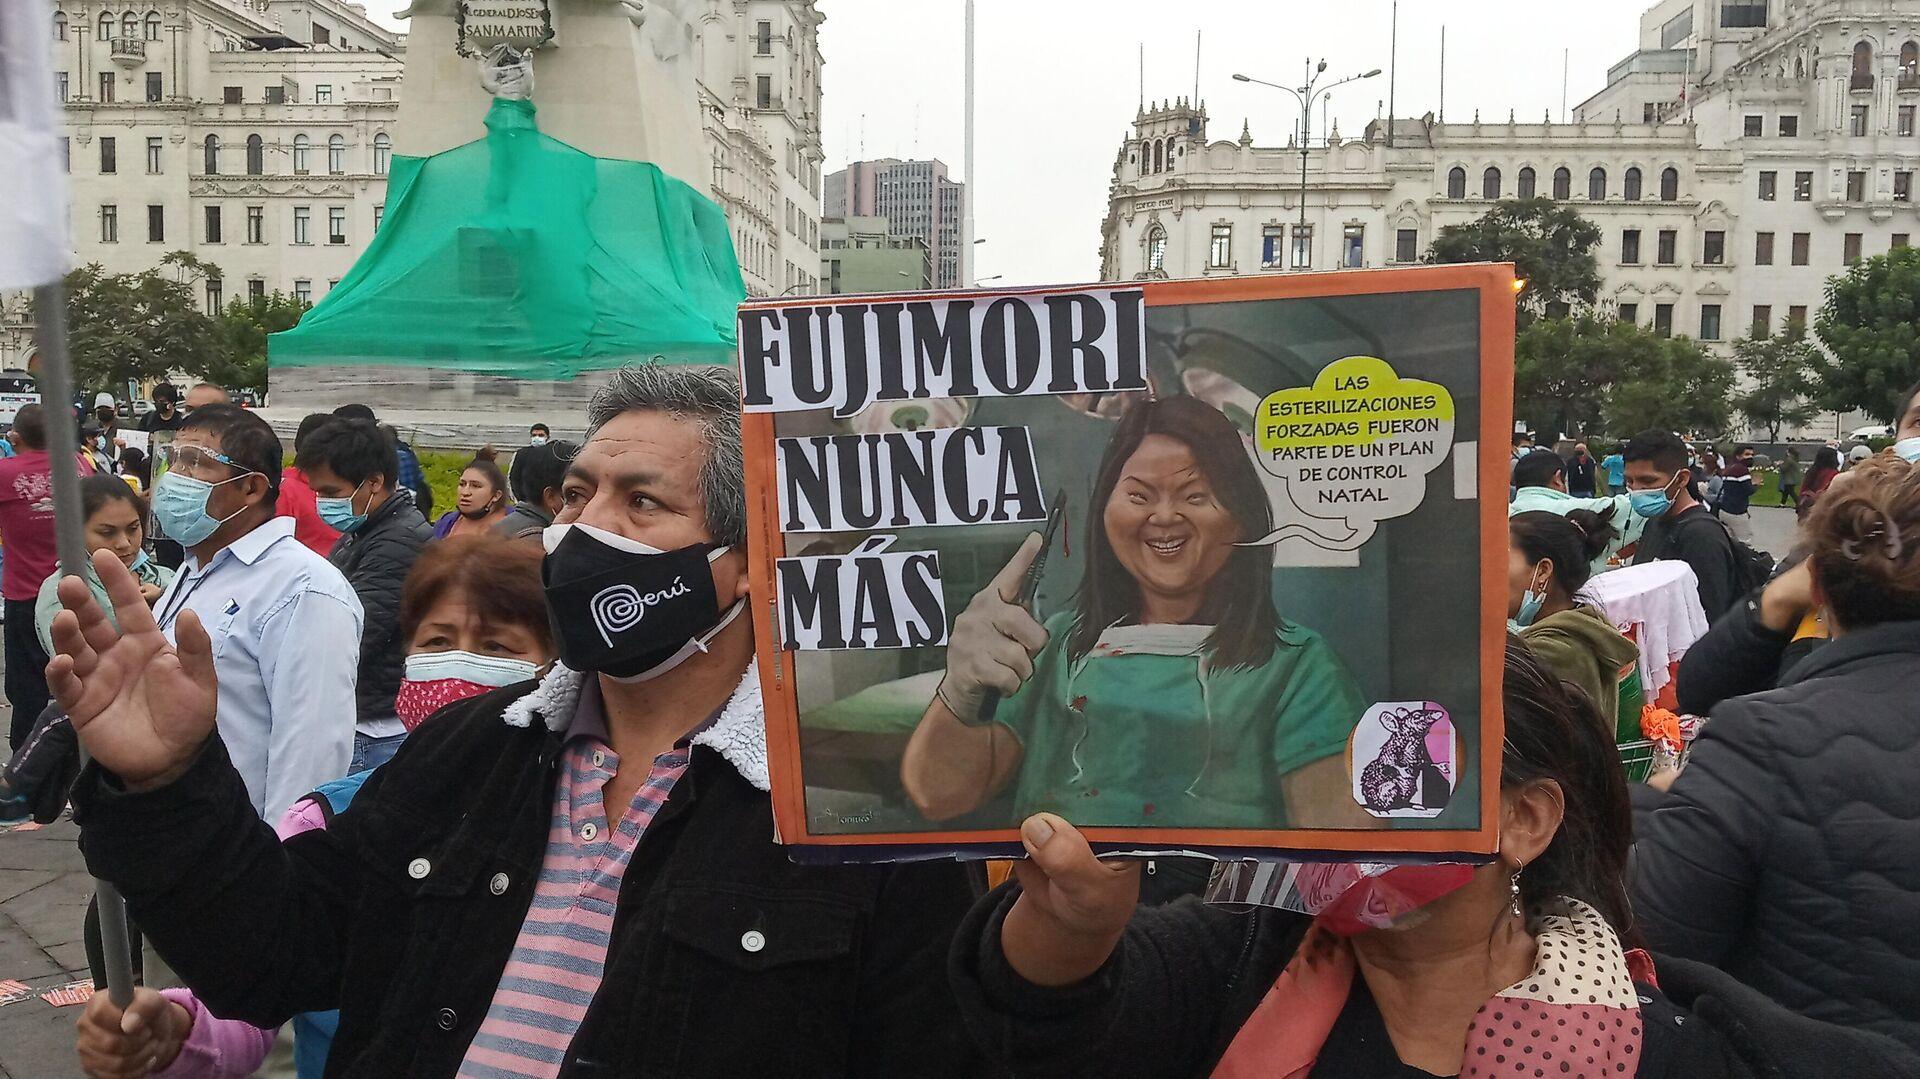 Rosa Elvira sosteniendo un cartel contra Keiko Fujimori - Sputnik Mundo, 1920, 30.05.2021